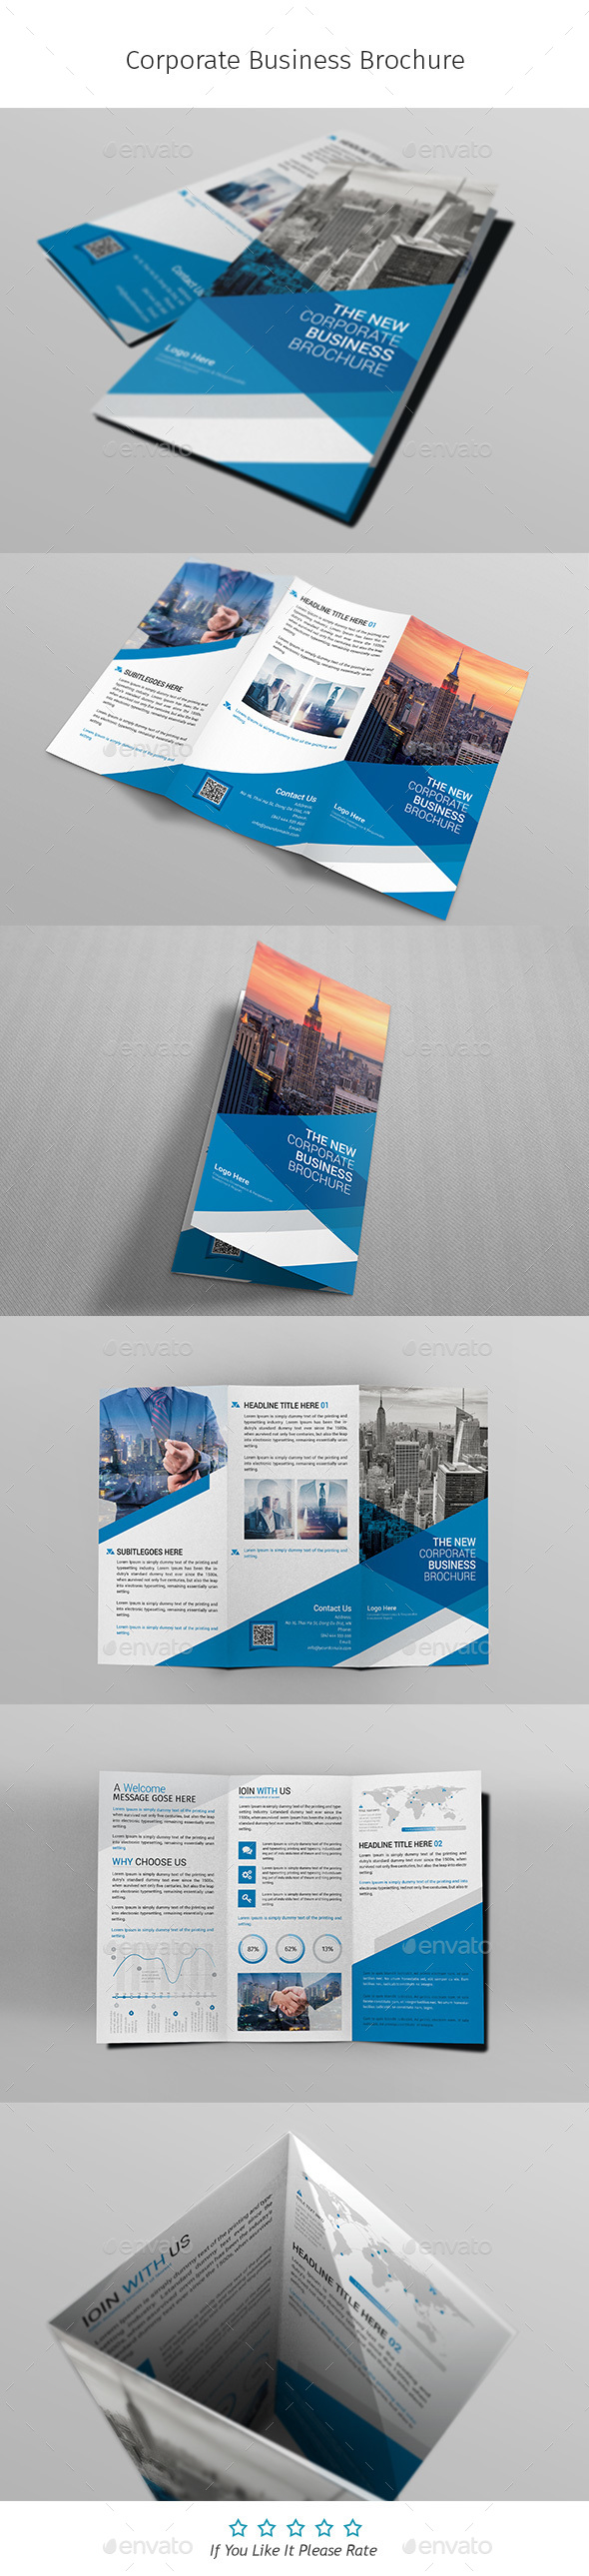 A4 Corporate Business Flyer Template Vol 02 - Corporate Brochures